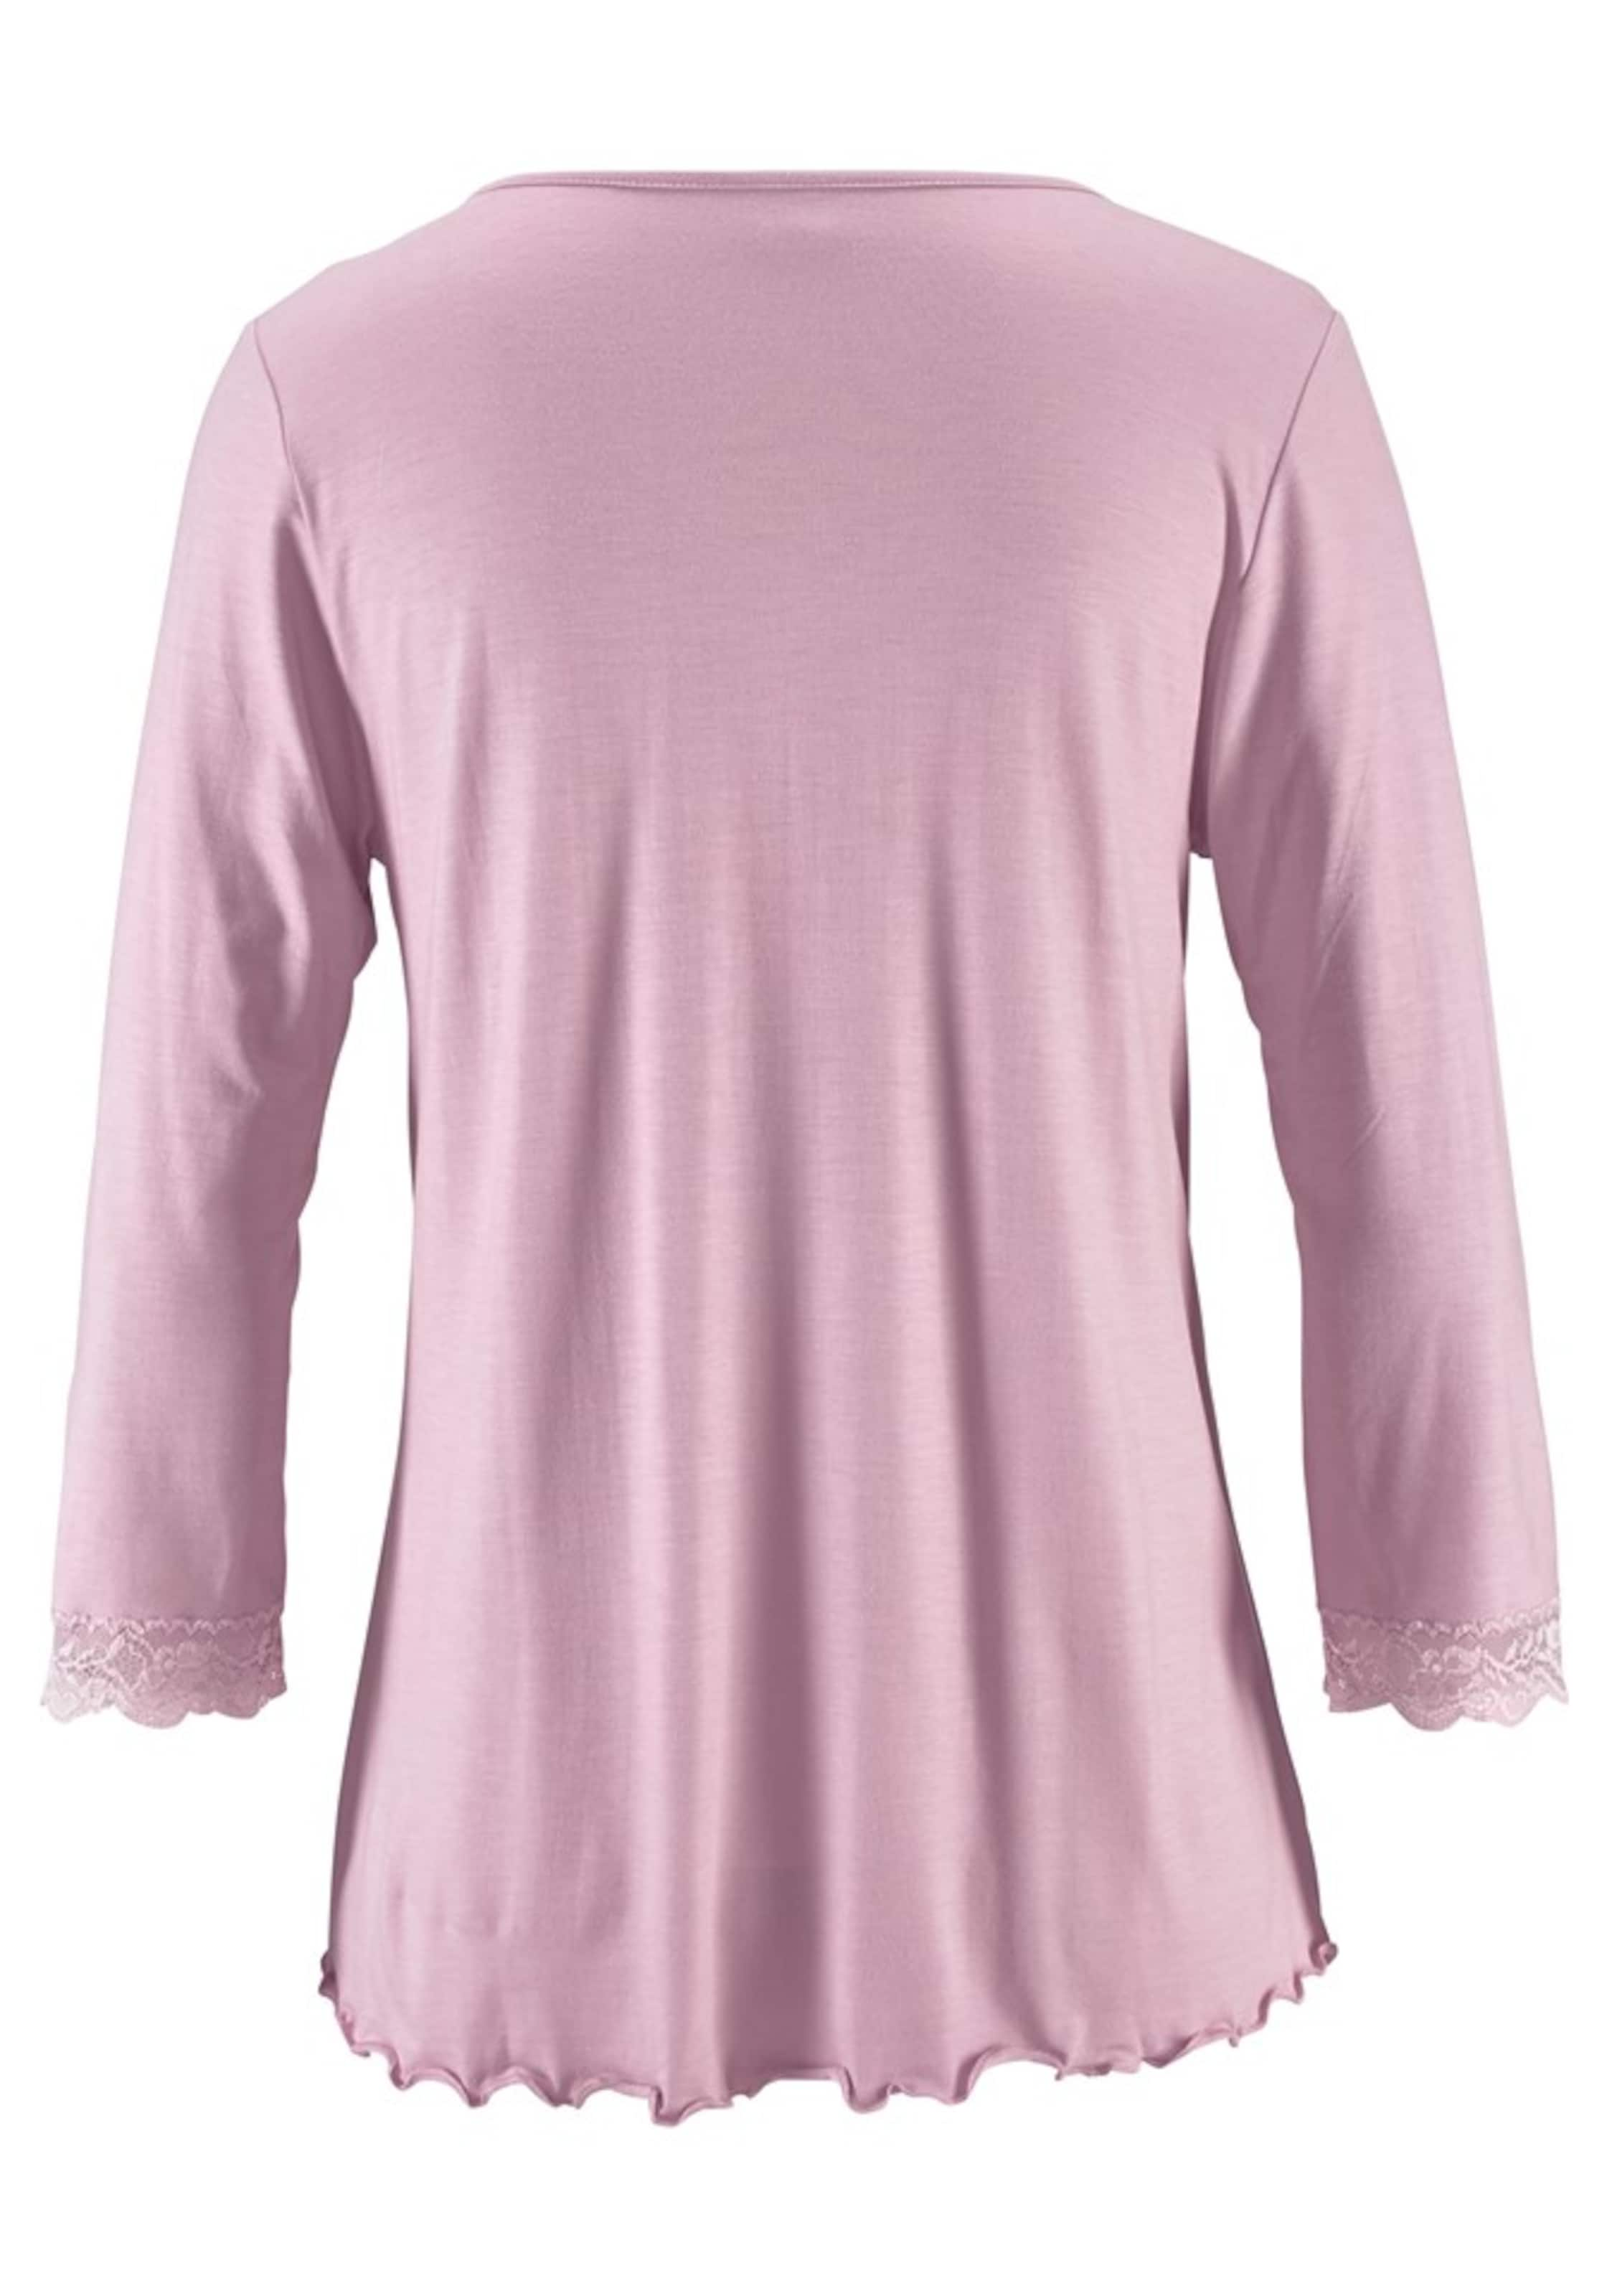 Raffungamp; In Lascana Pyjama Mit Spitzenkante Rosa QroWedCxBE